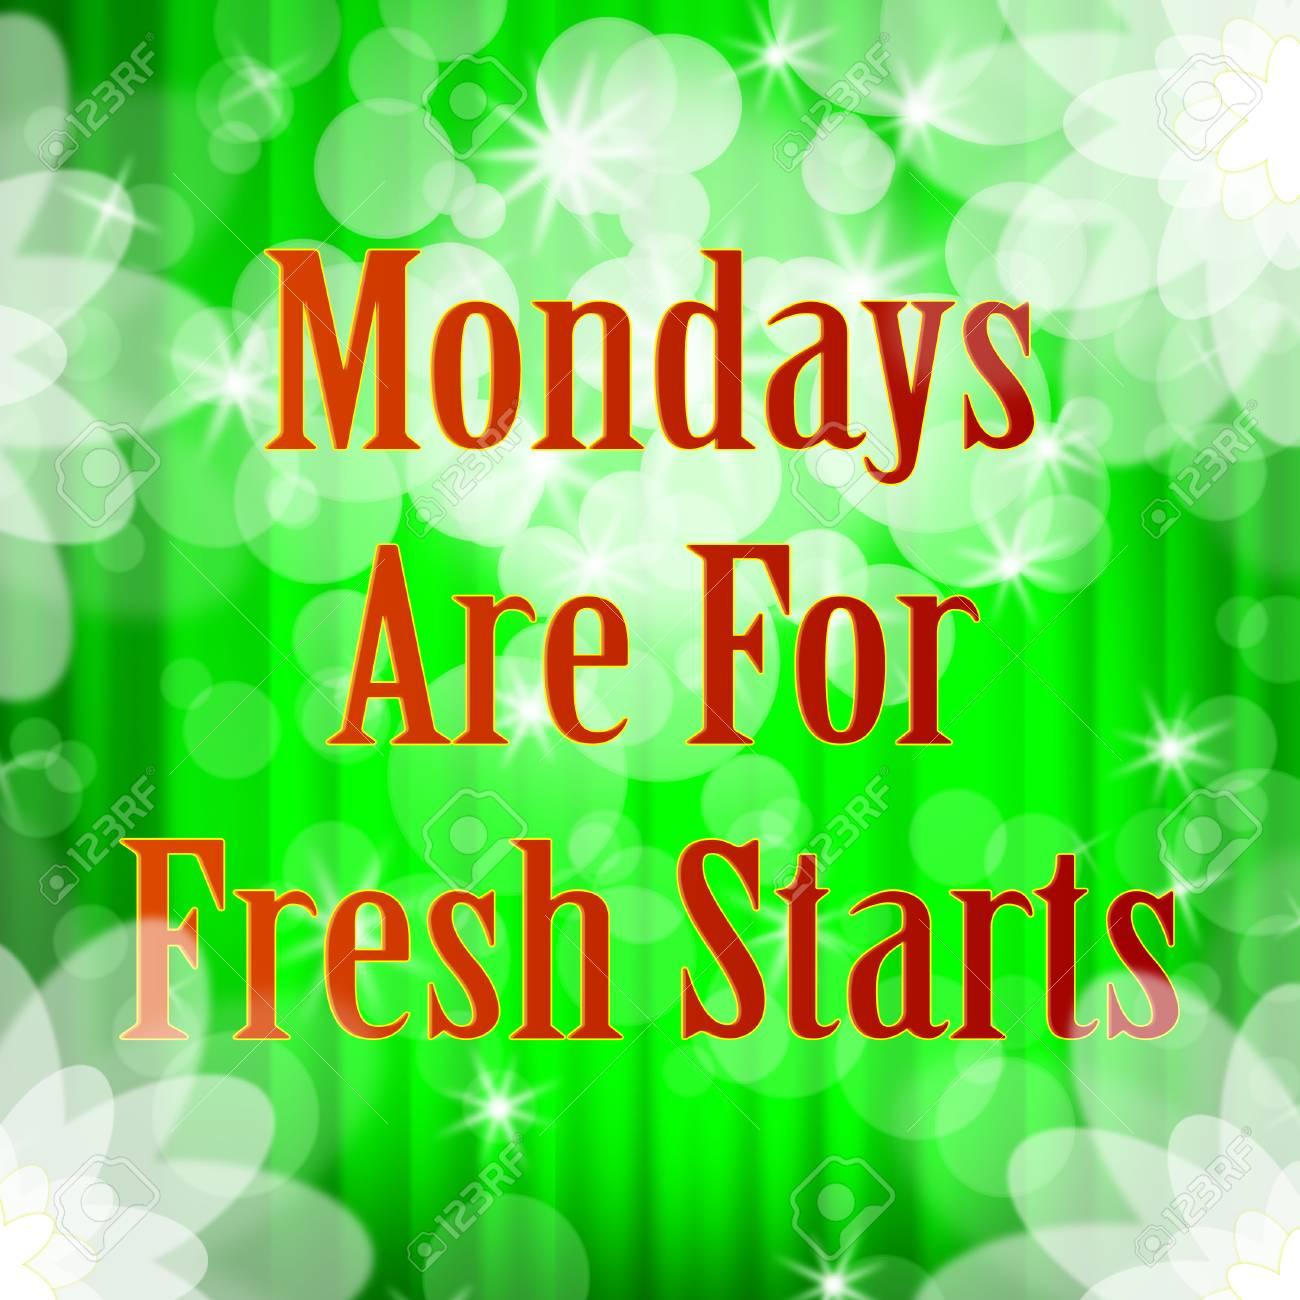 Monday Work Quotes Fresh Start Bokeh 3d Illustration Stock Photo